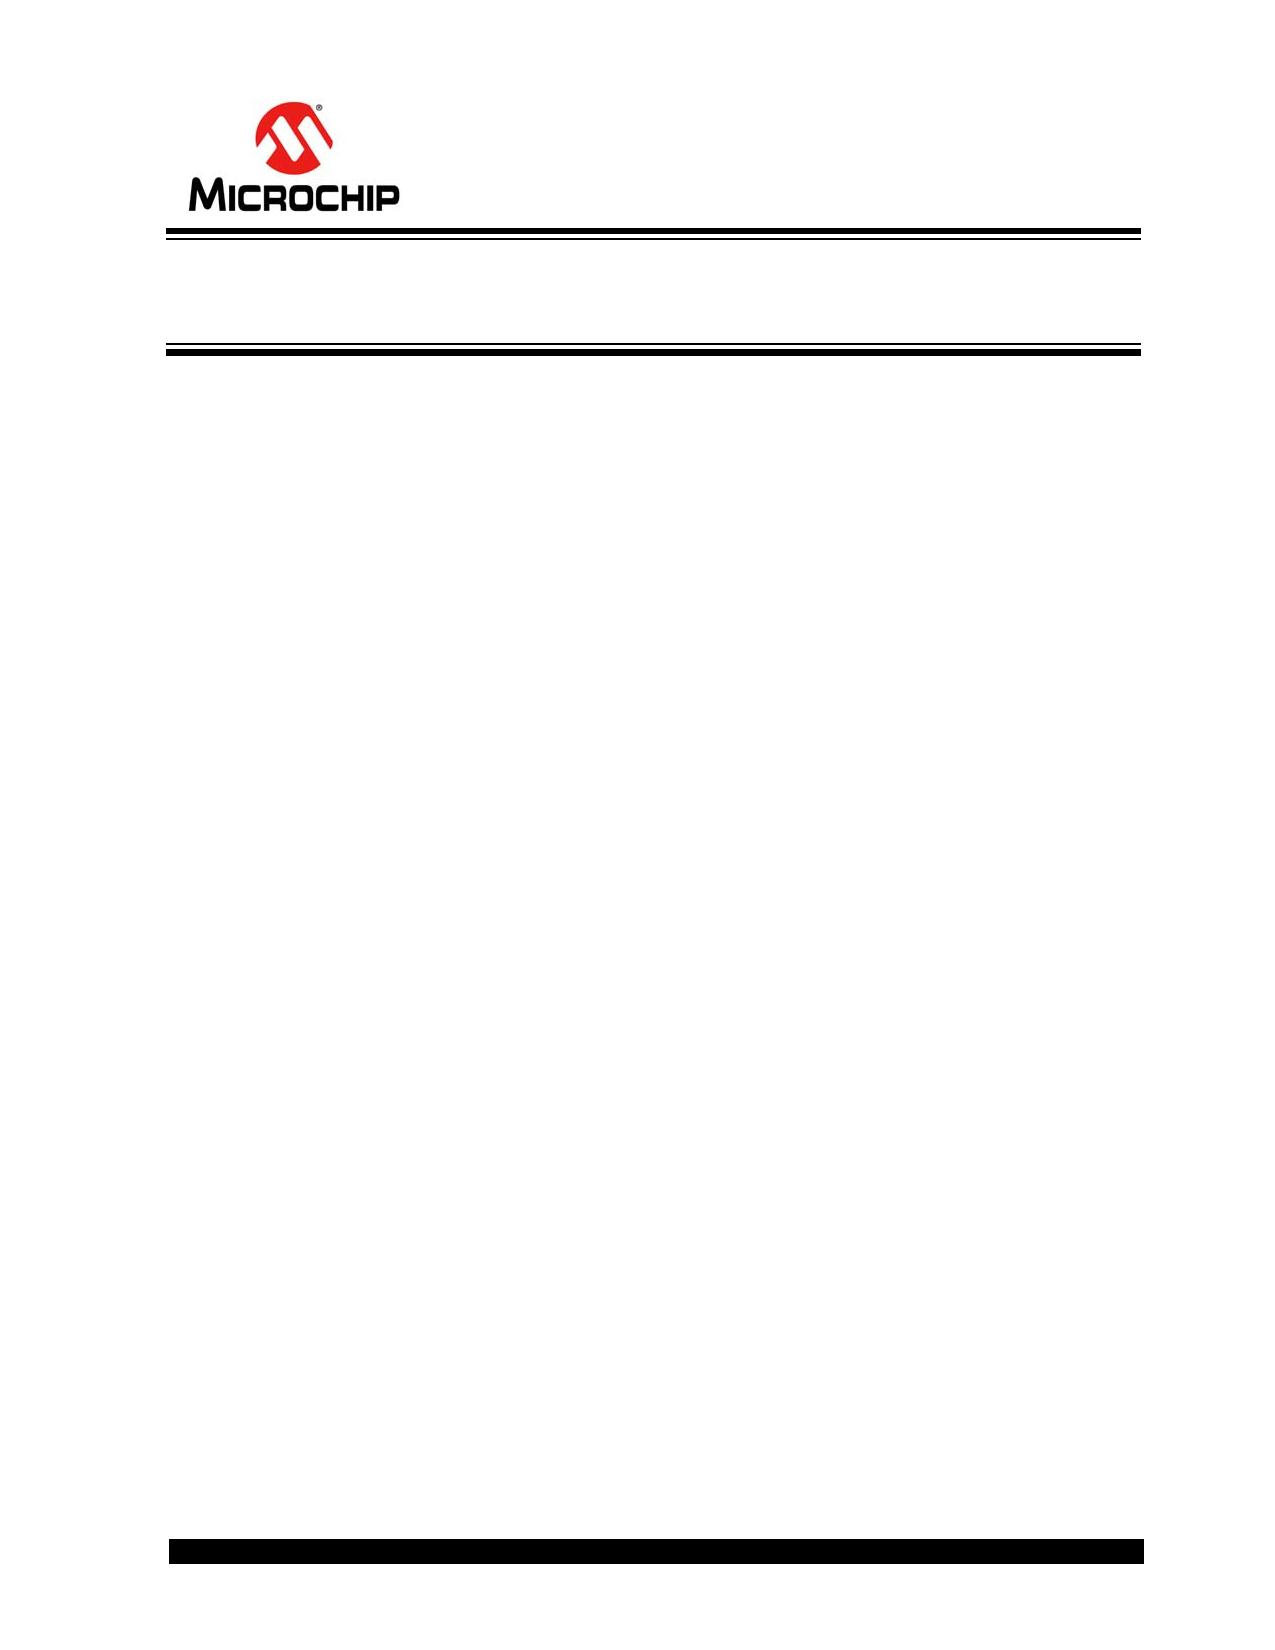 PIC24FV32KA302 데이터시트 및 PIC24FV32KA302 PDF